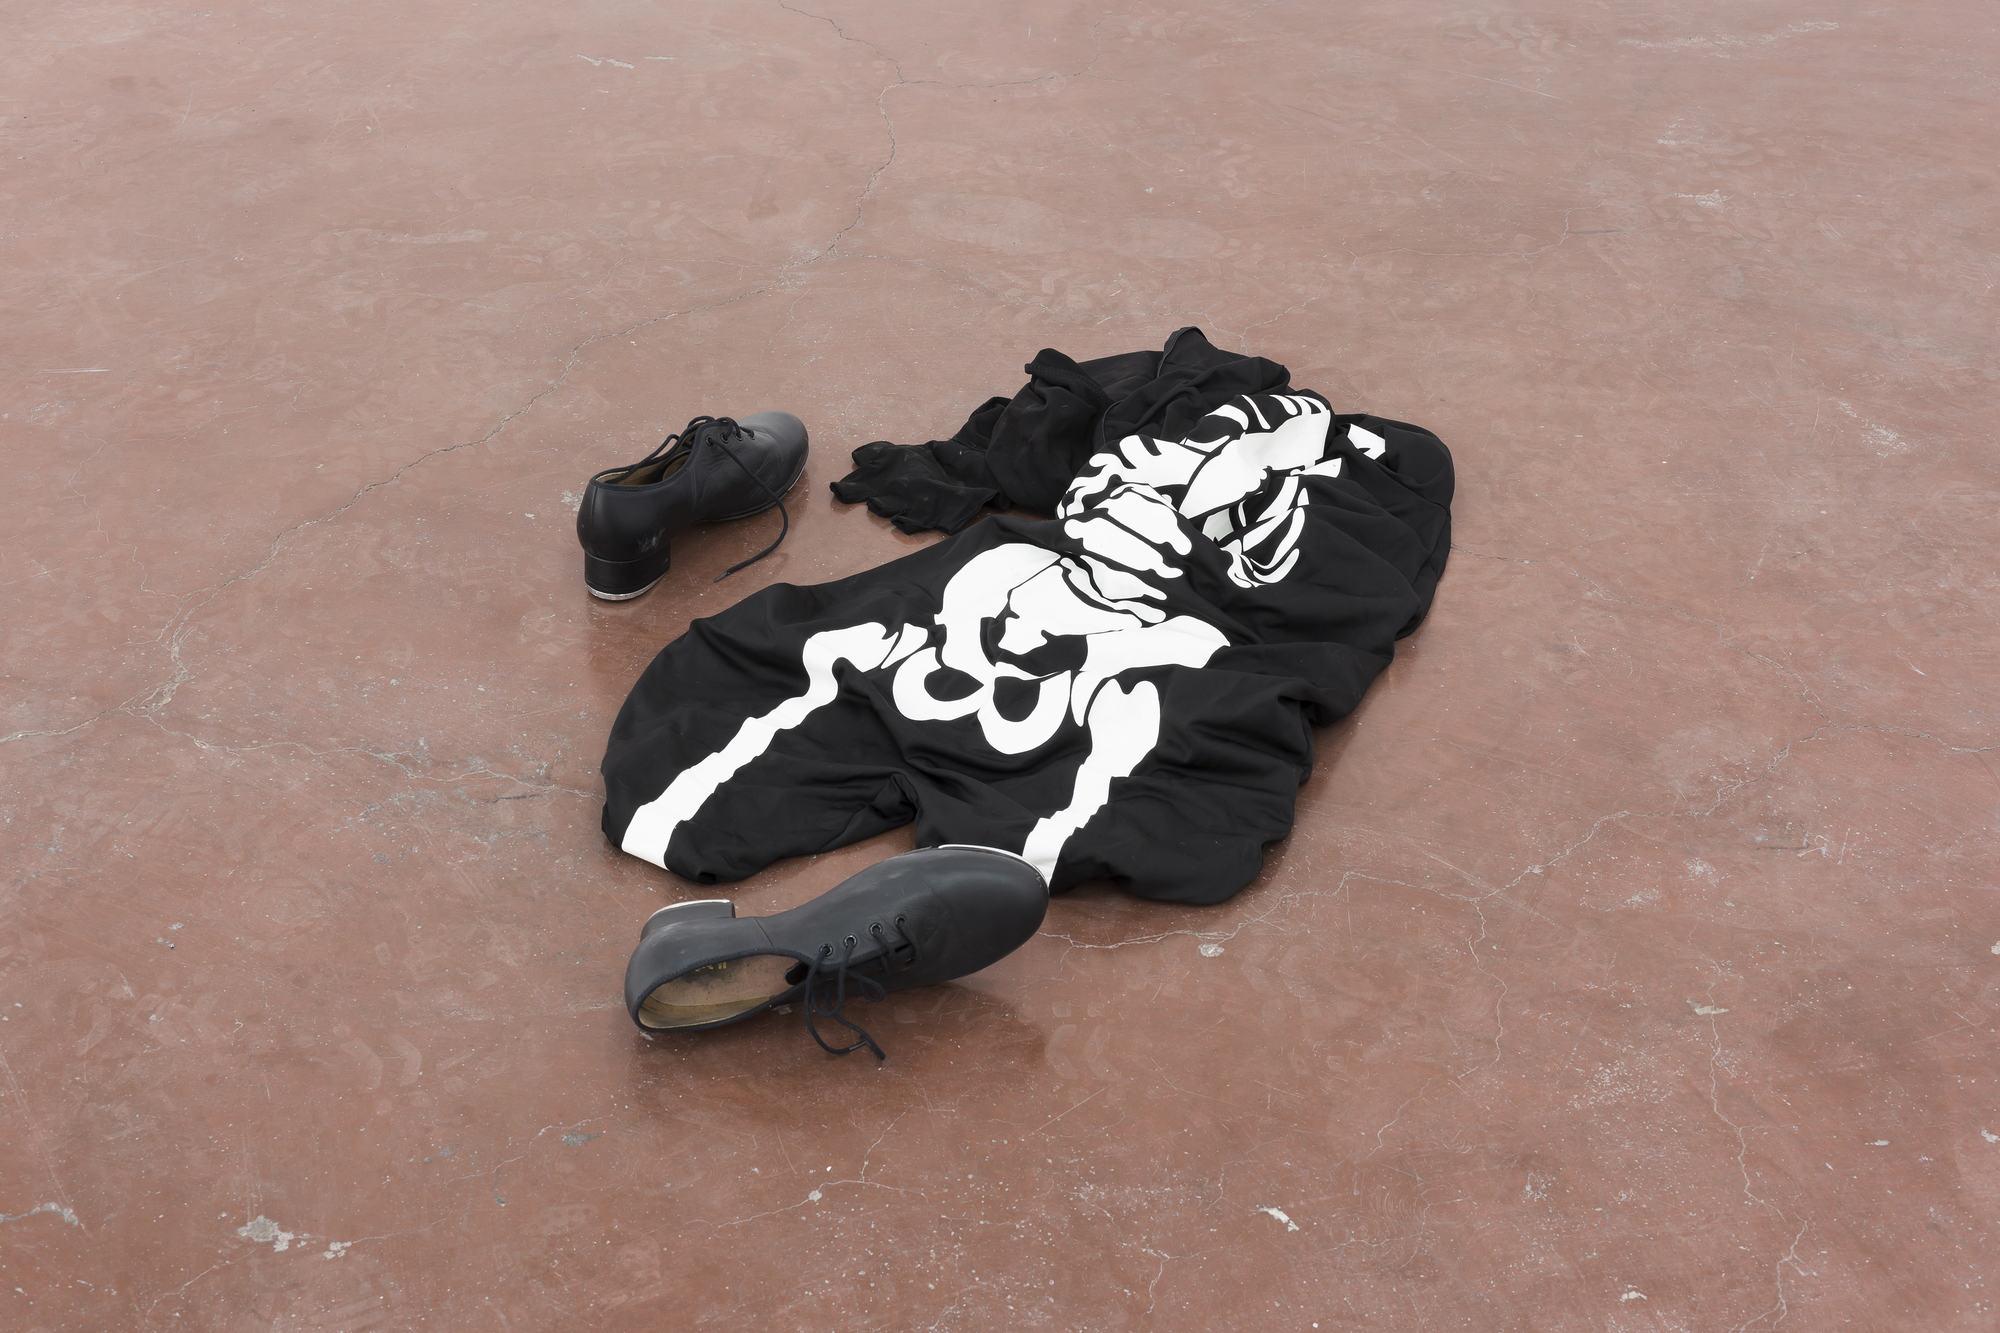 Latifa Echakhch, Untitled (Dancer), 2013, Skeleton costume, tap shoes, 60 cm diam, unique